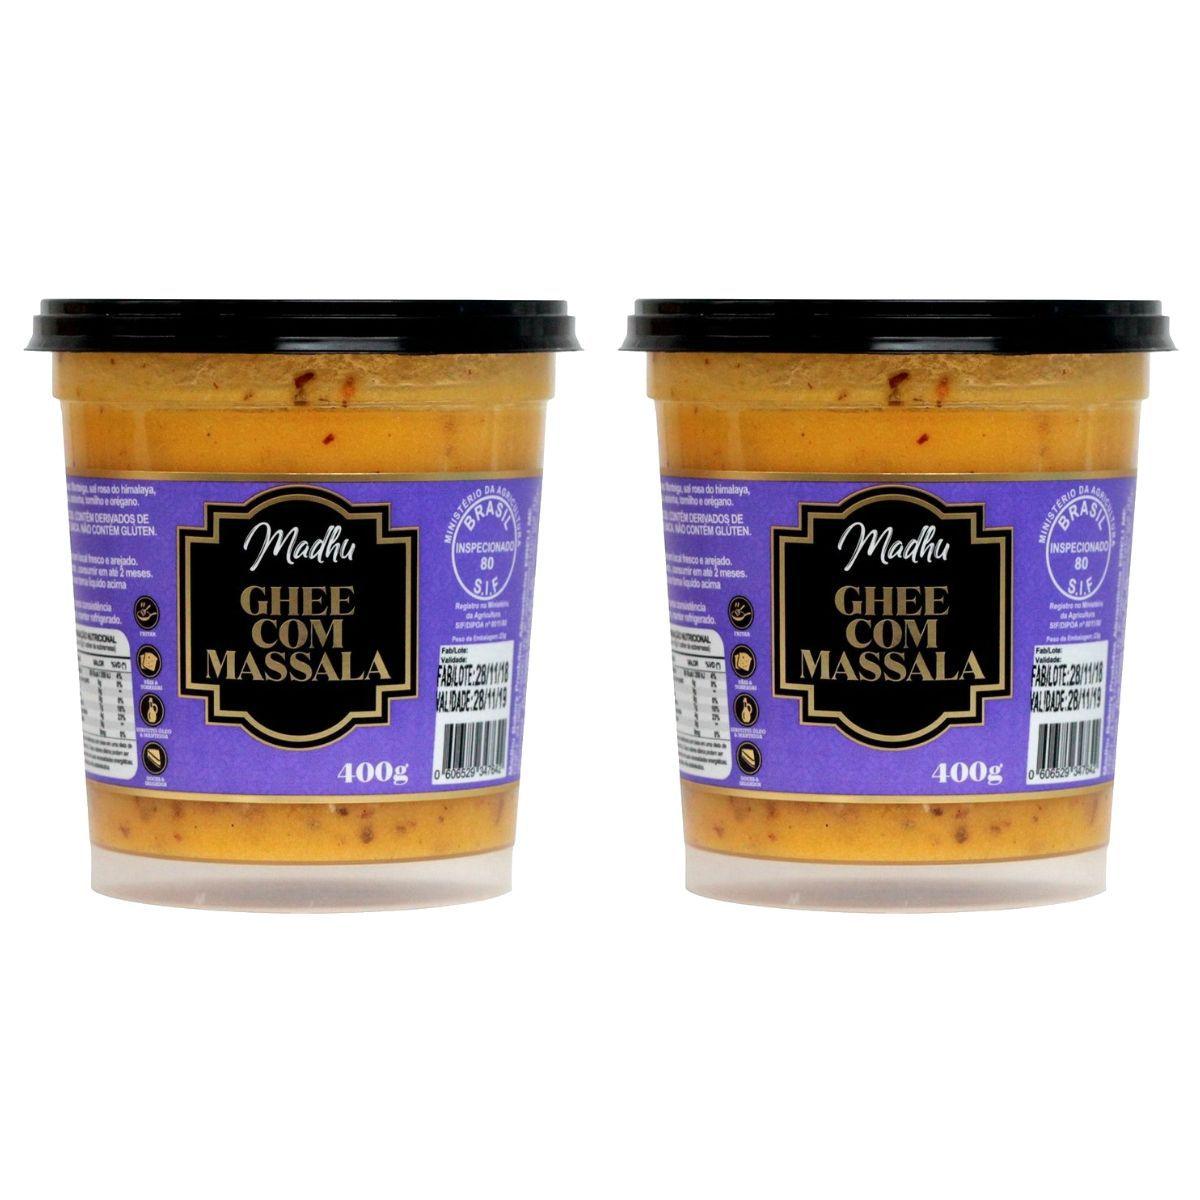 Kit 2 Manteiga Ghee C/ Massala Clarificada 400mg - Madhu Bakery